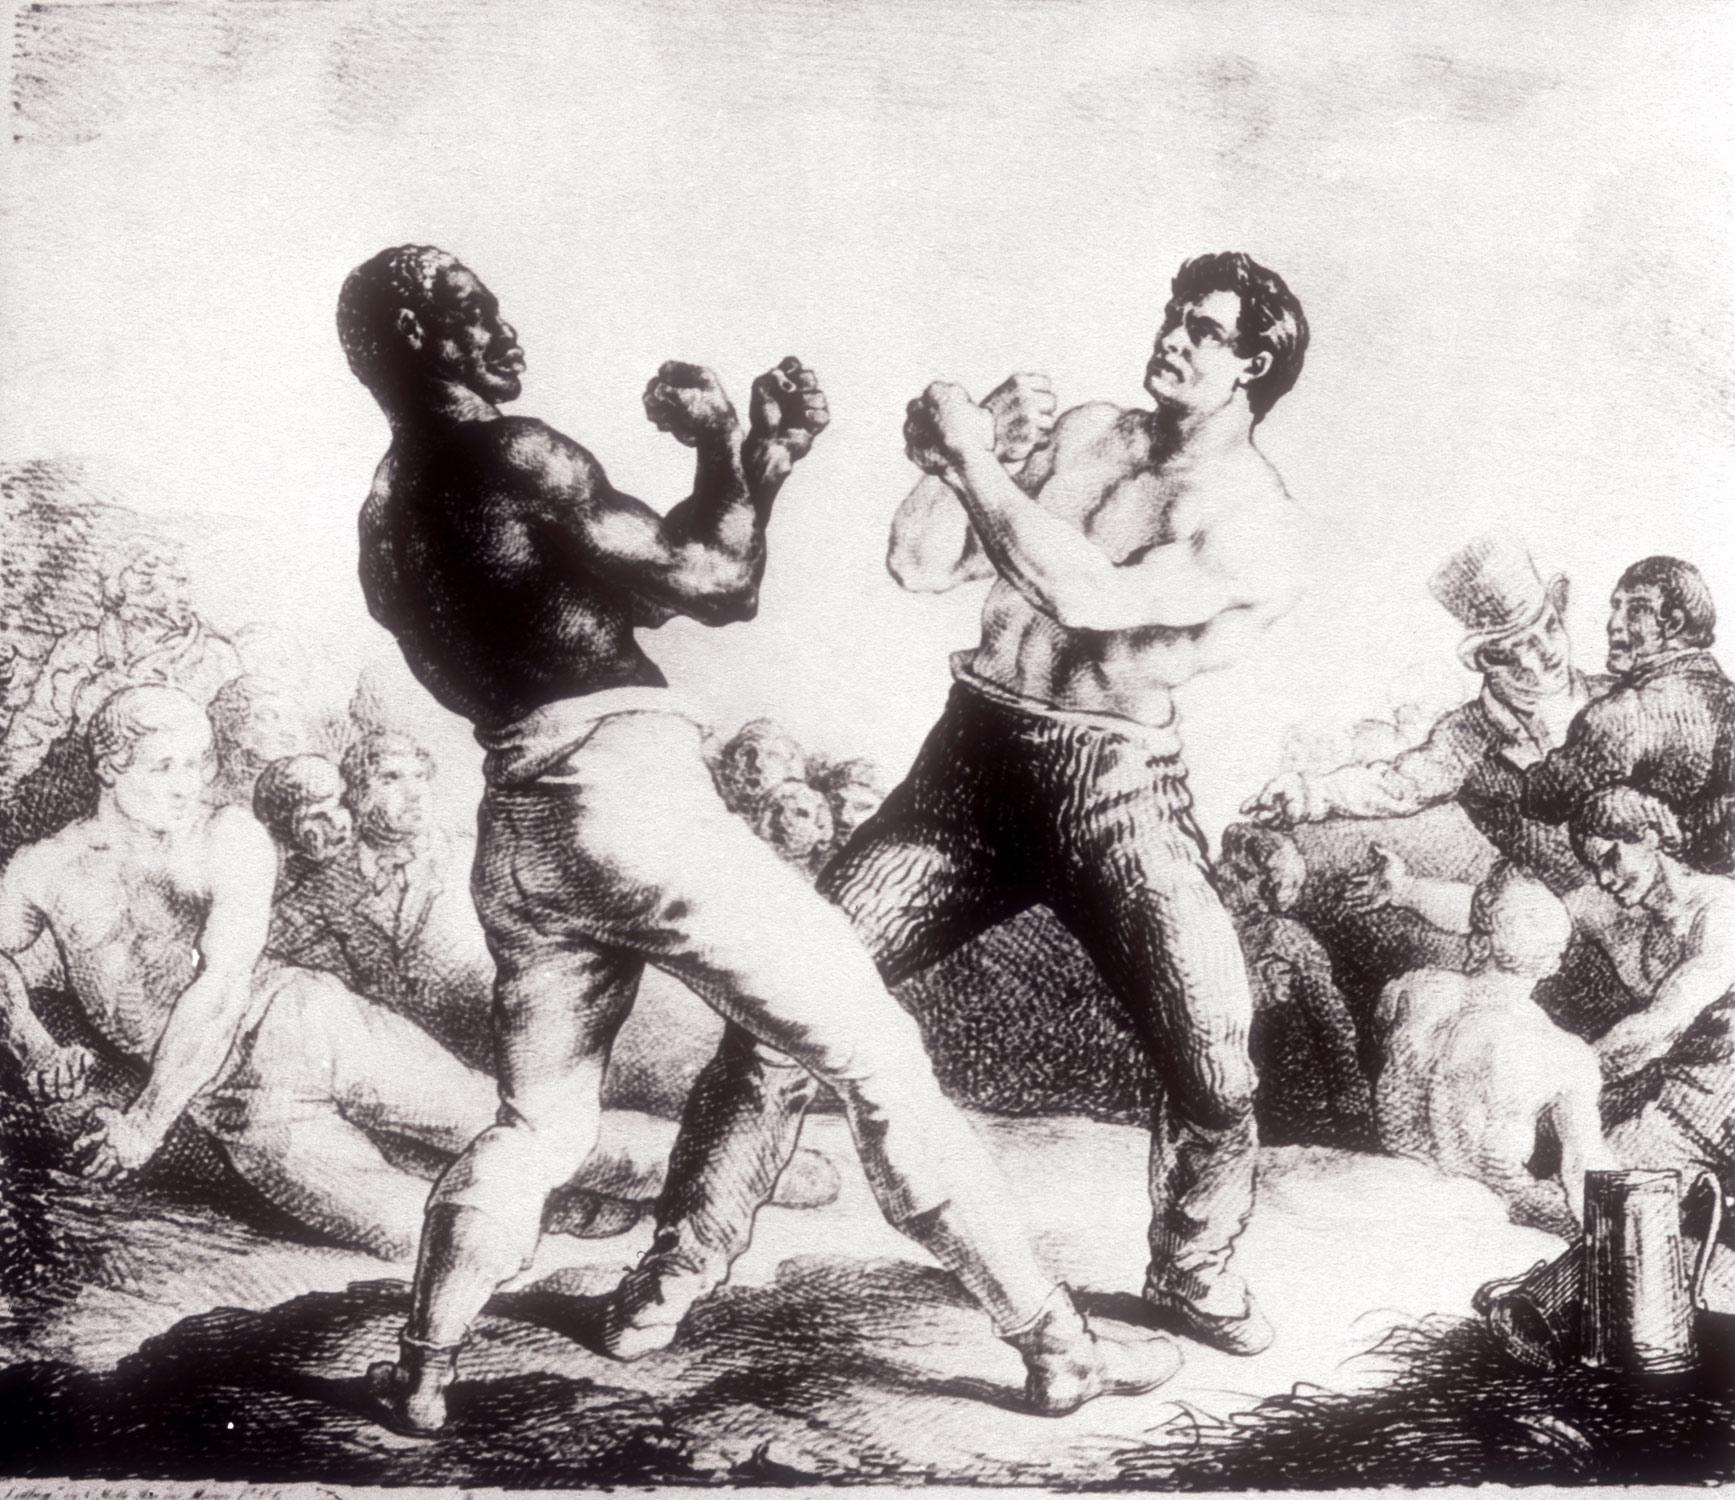 r ticism essay heilbrunn timeline of art history the boxers